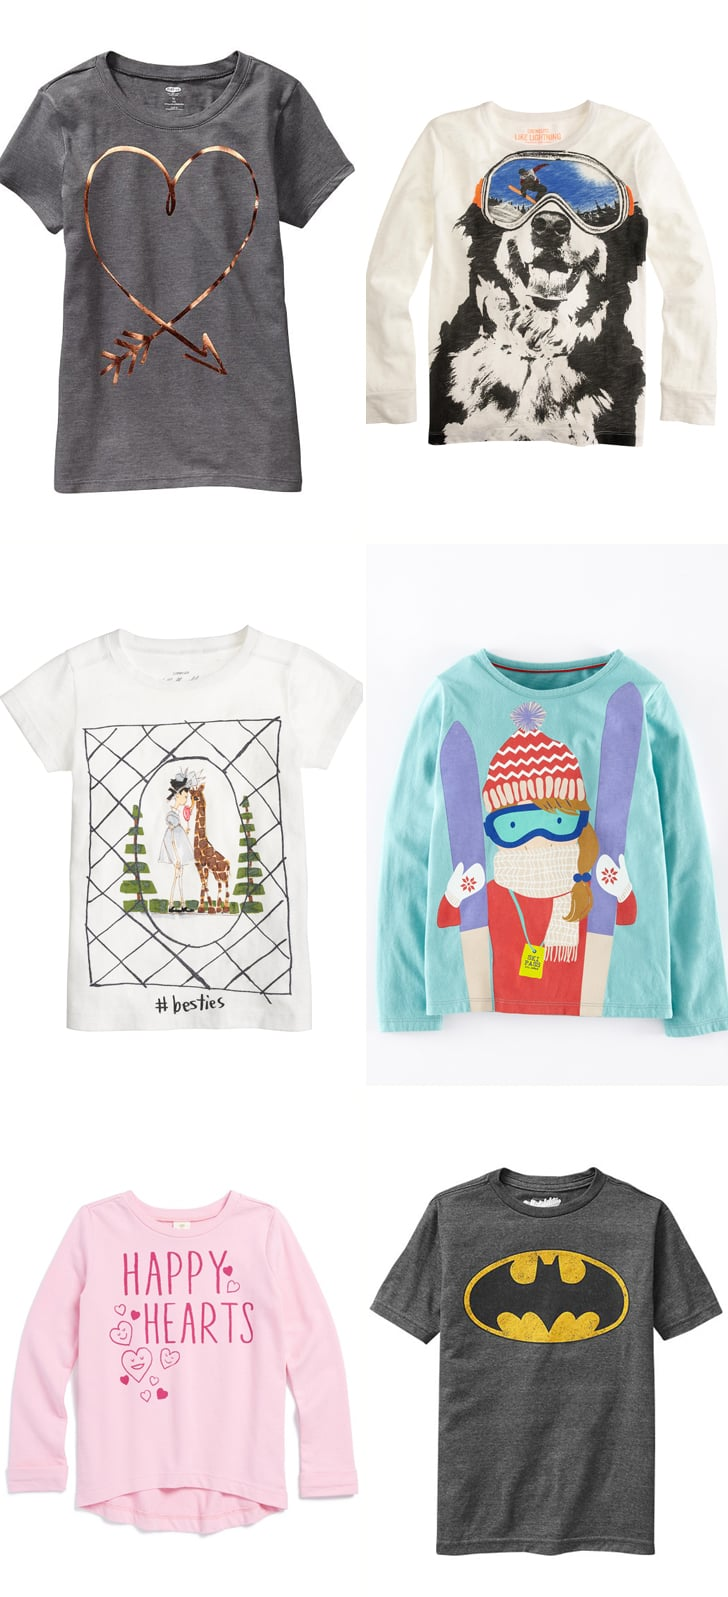 7e0863b6f Tucker + Tate High-Low Happy Hearts Shirt | Cute Graphic Tees For Kids |  POPSUGAR Family Photo 6